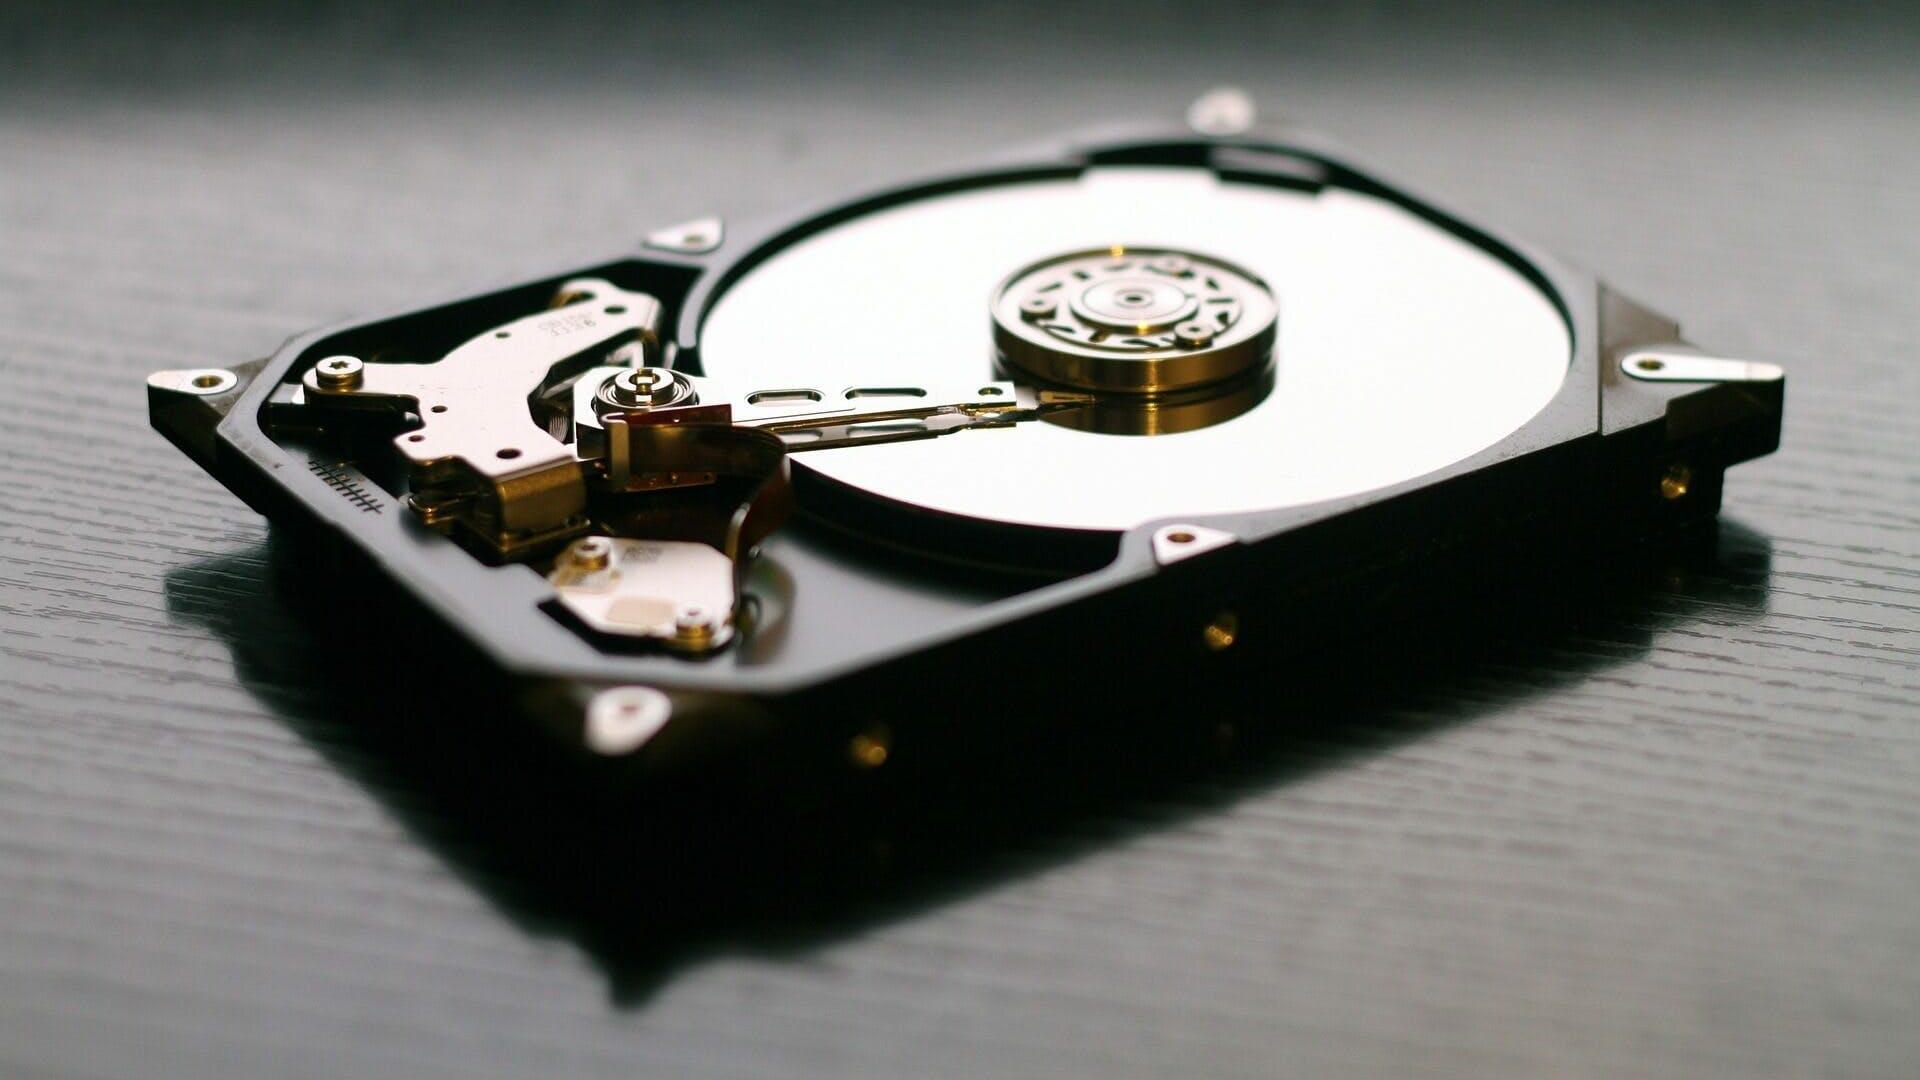 hard drive representing f2fs